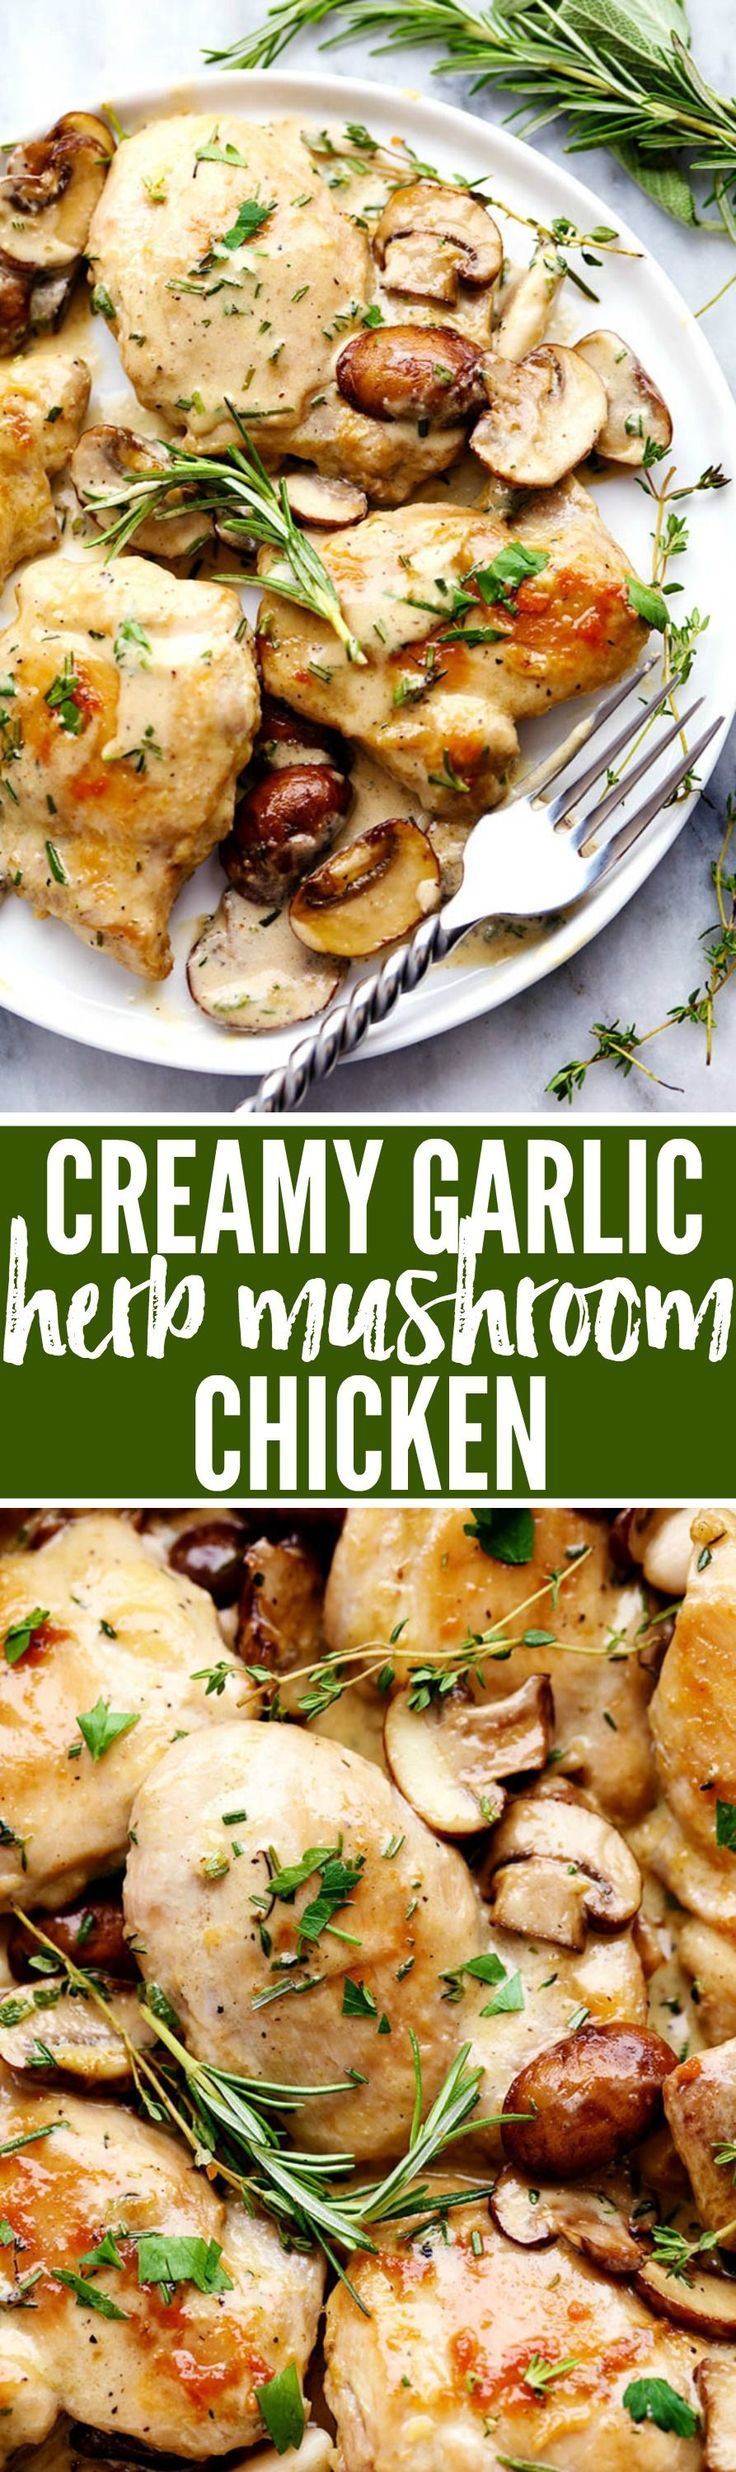 25+ best ideas about Creamy garlic mushrooms on Pinterest